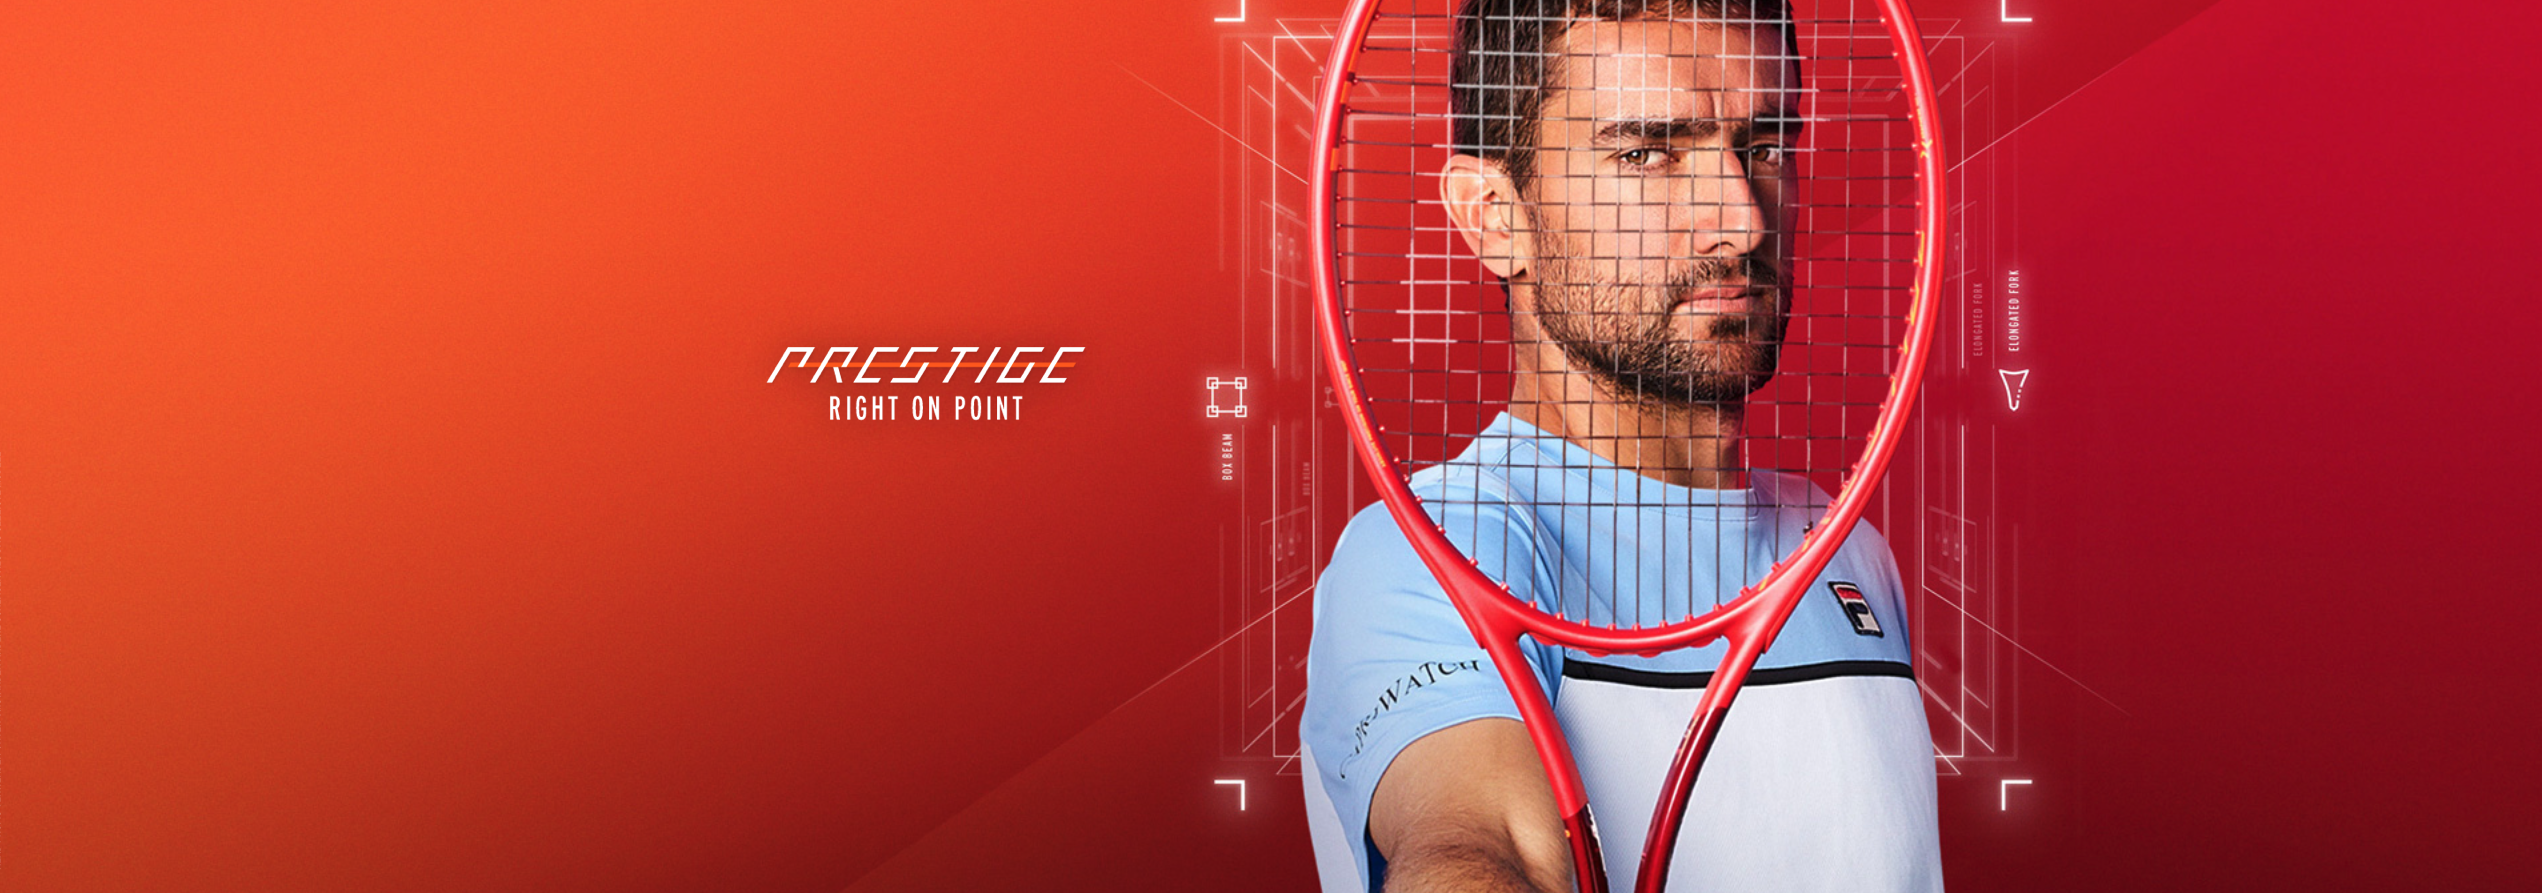 Head Prestige Rackets – Right on point